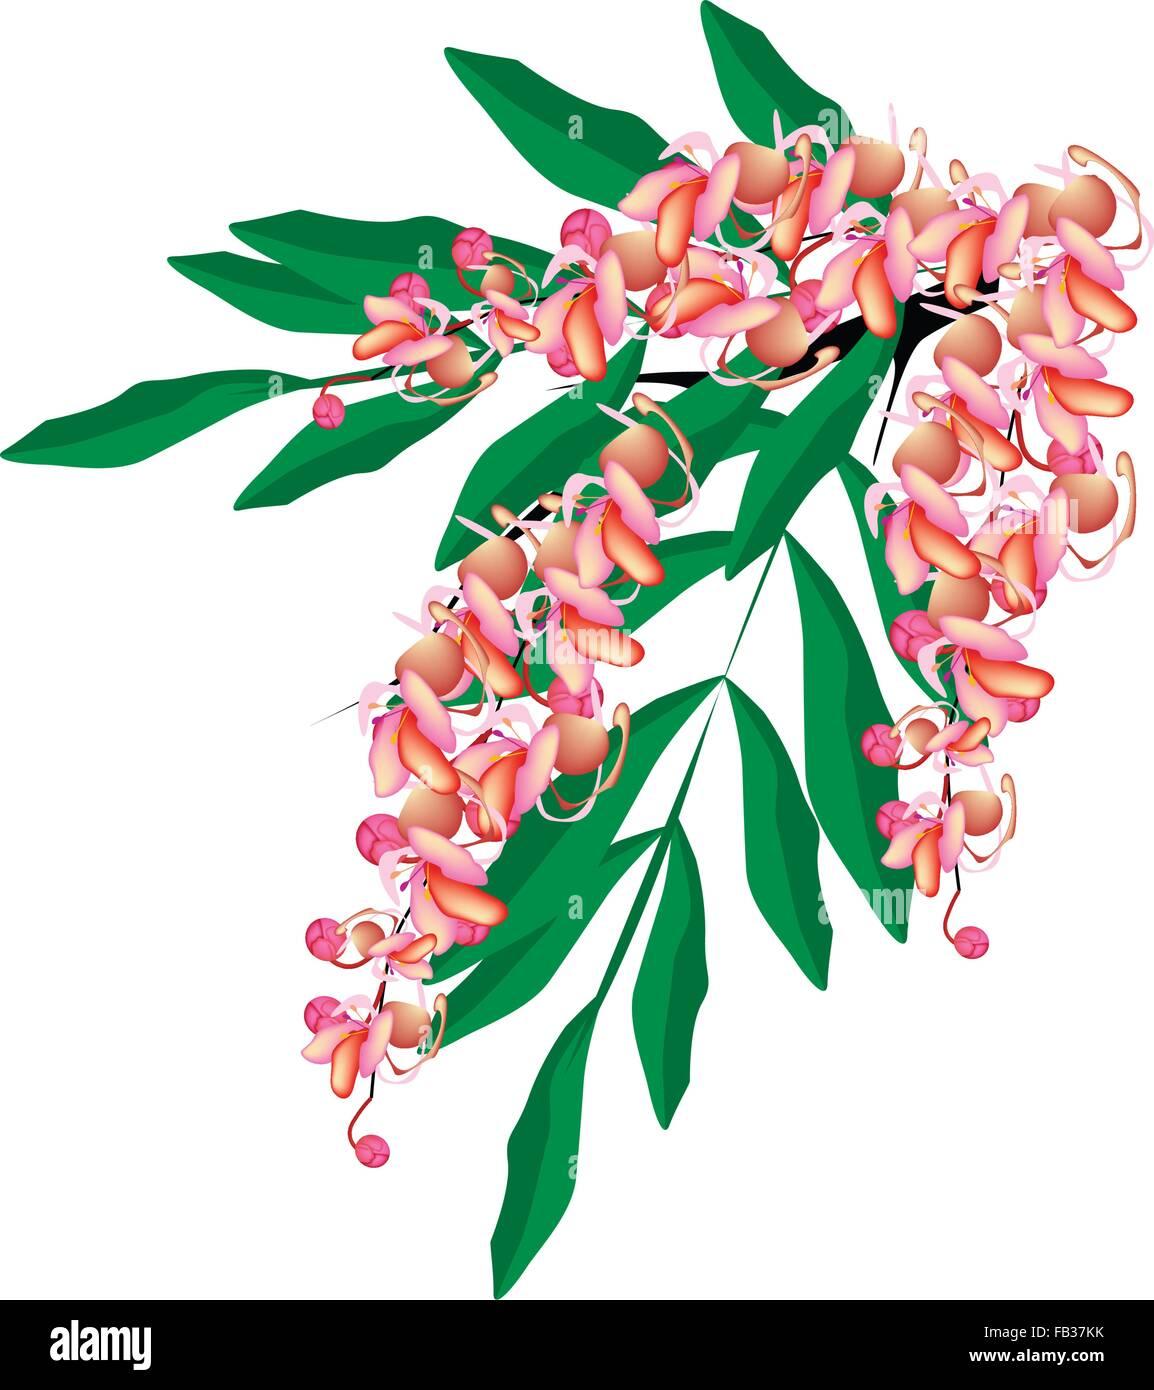 Beautiful Flower Illustration Pink Color Of Cassia Fistula Wishing